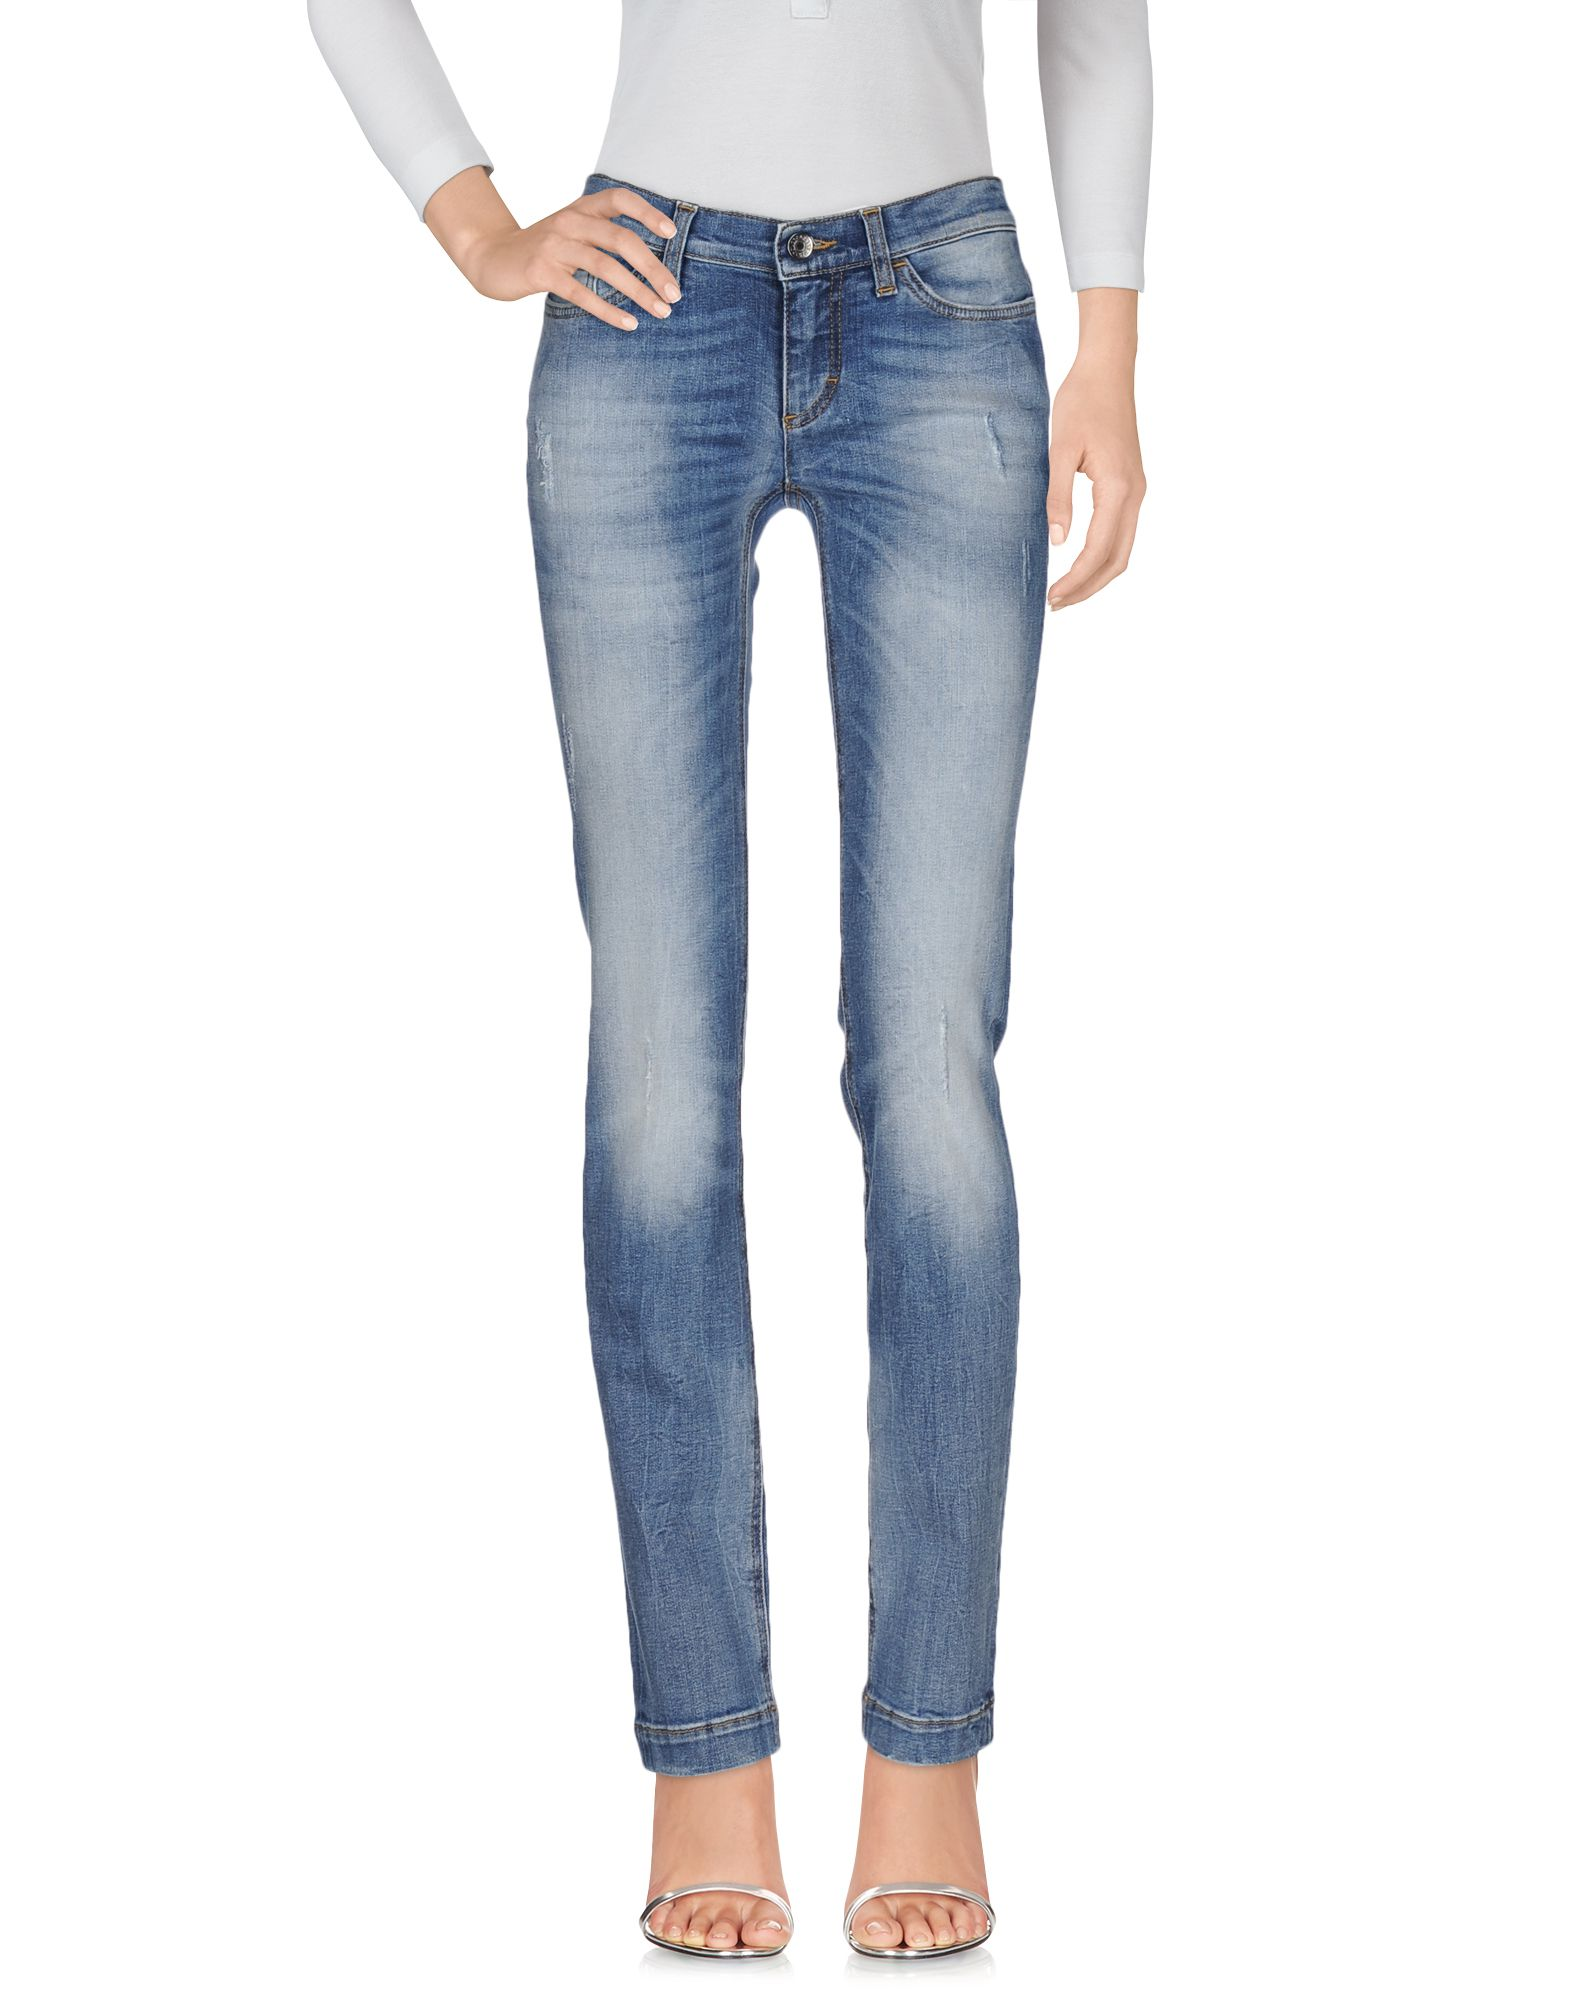 Pantaloni Jeans Dolce & Gabbana Donna - Acquista online su GpZOHxYGMJ